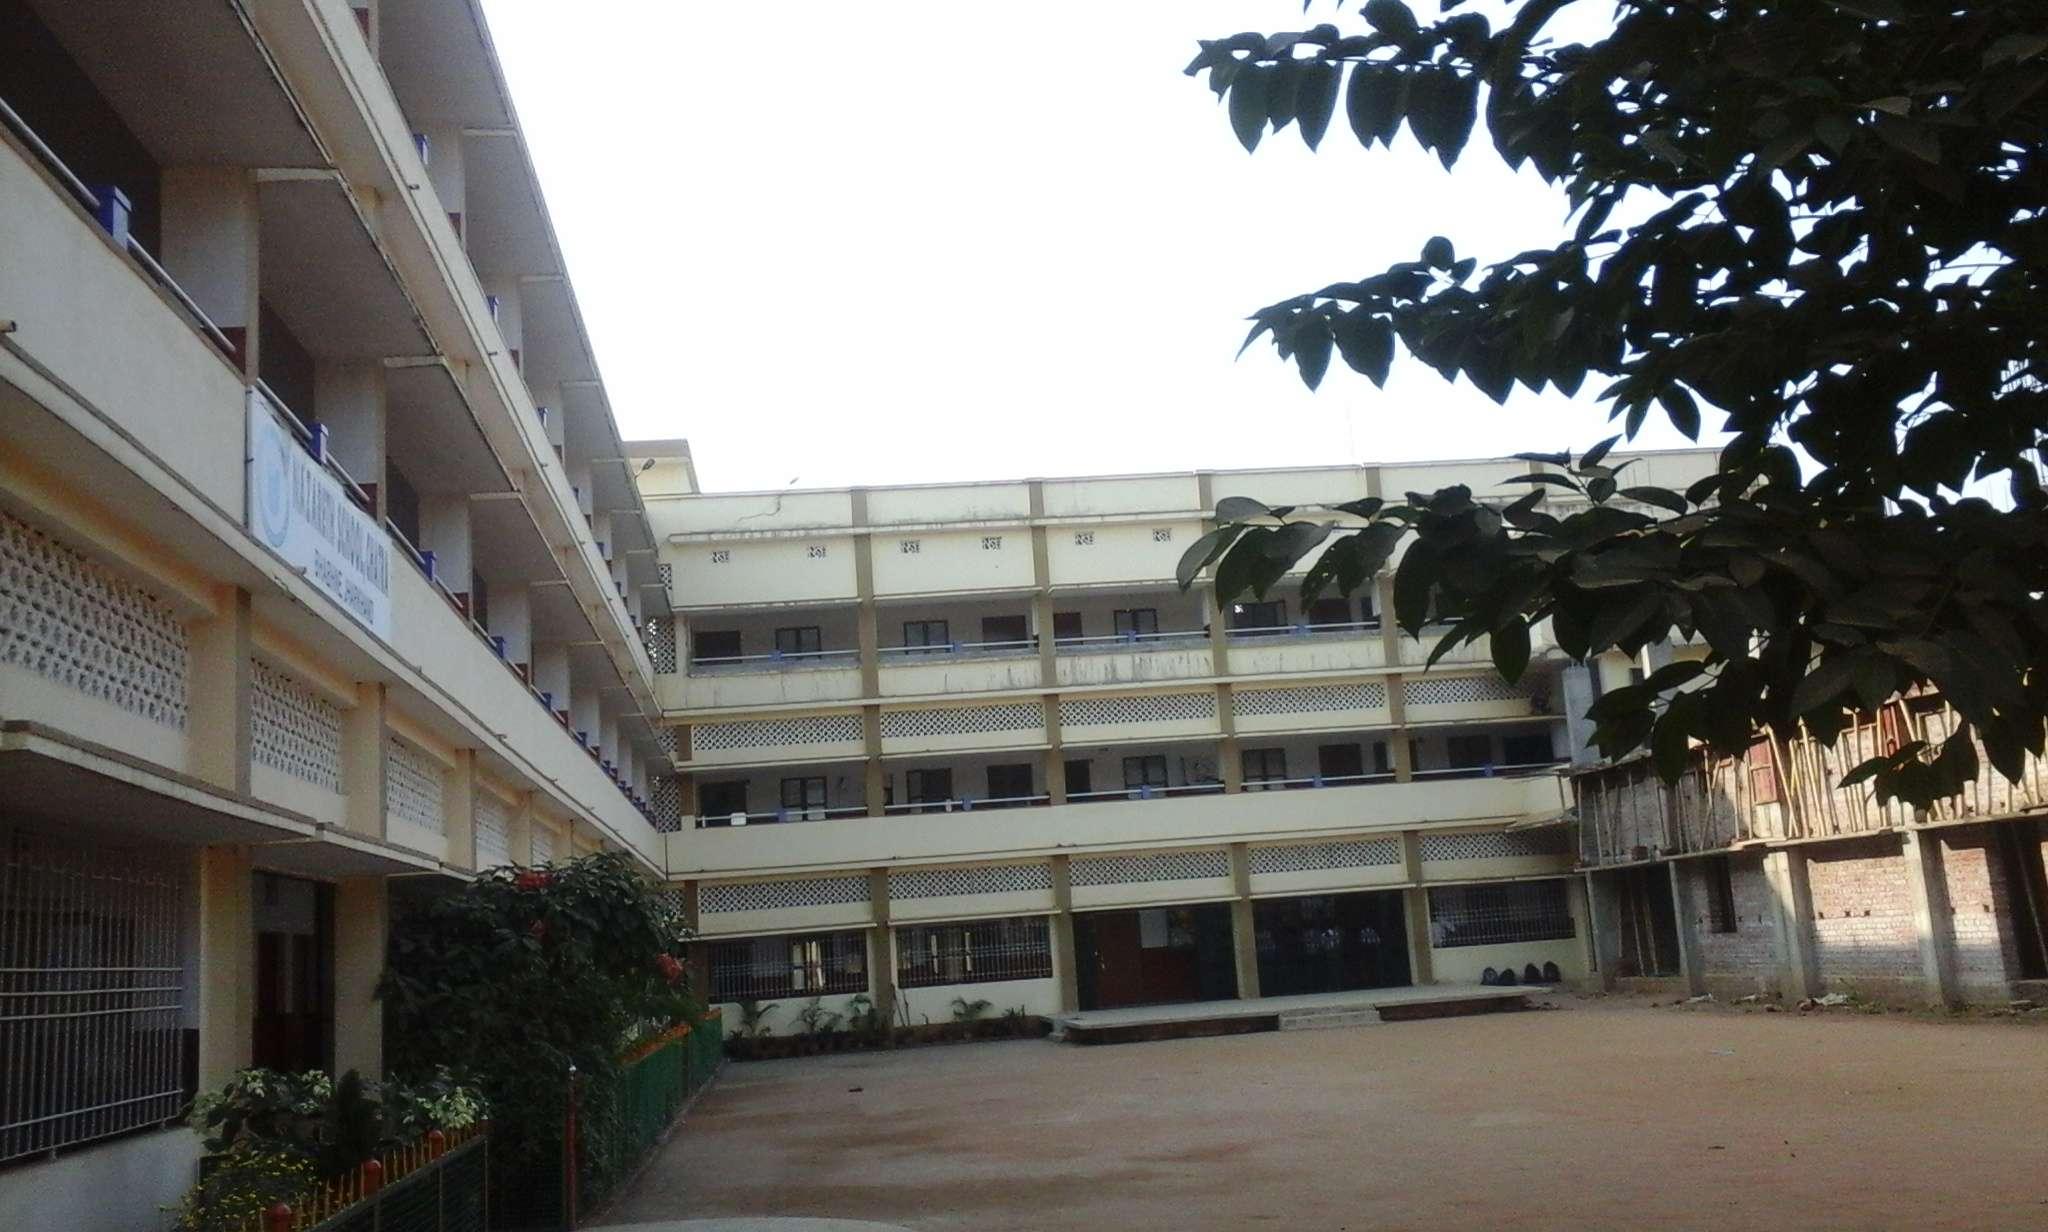 NAZARETH SCHOOL CHATRA JHARKHAND 3430303